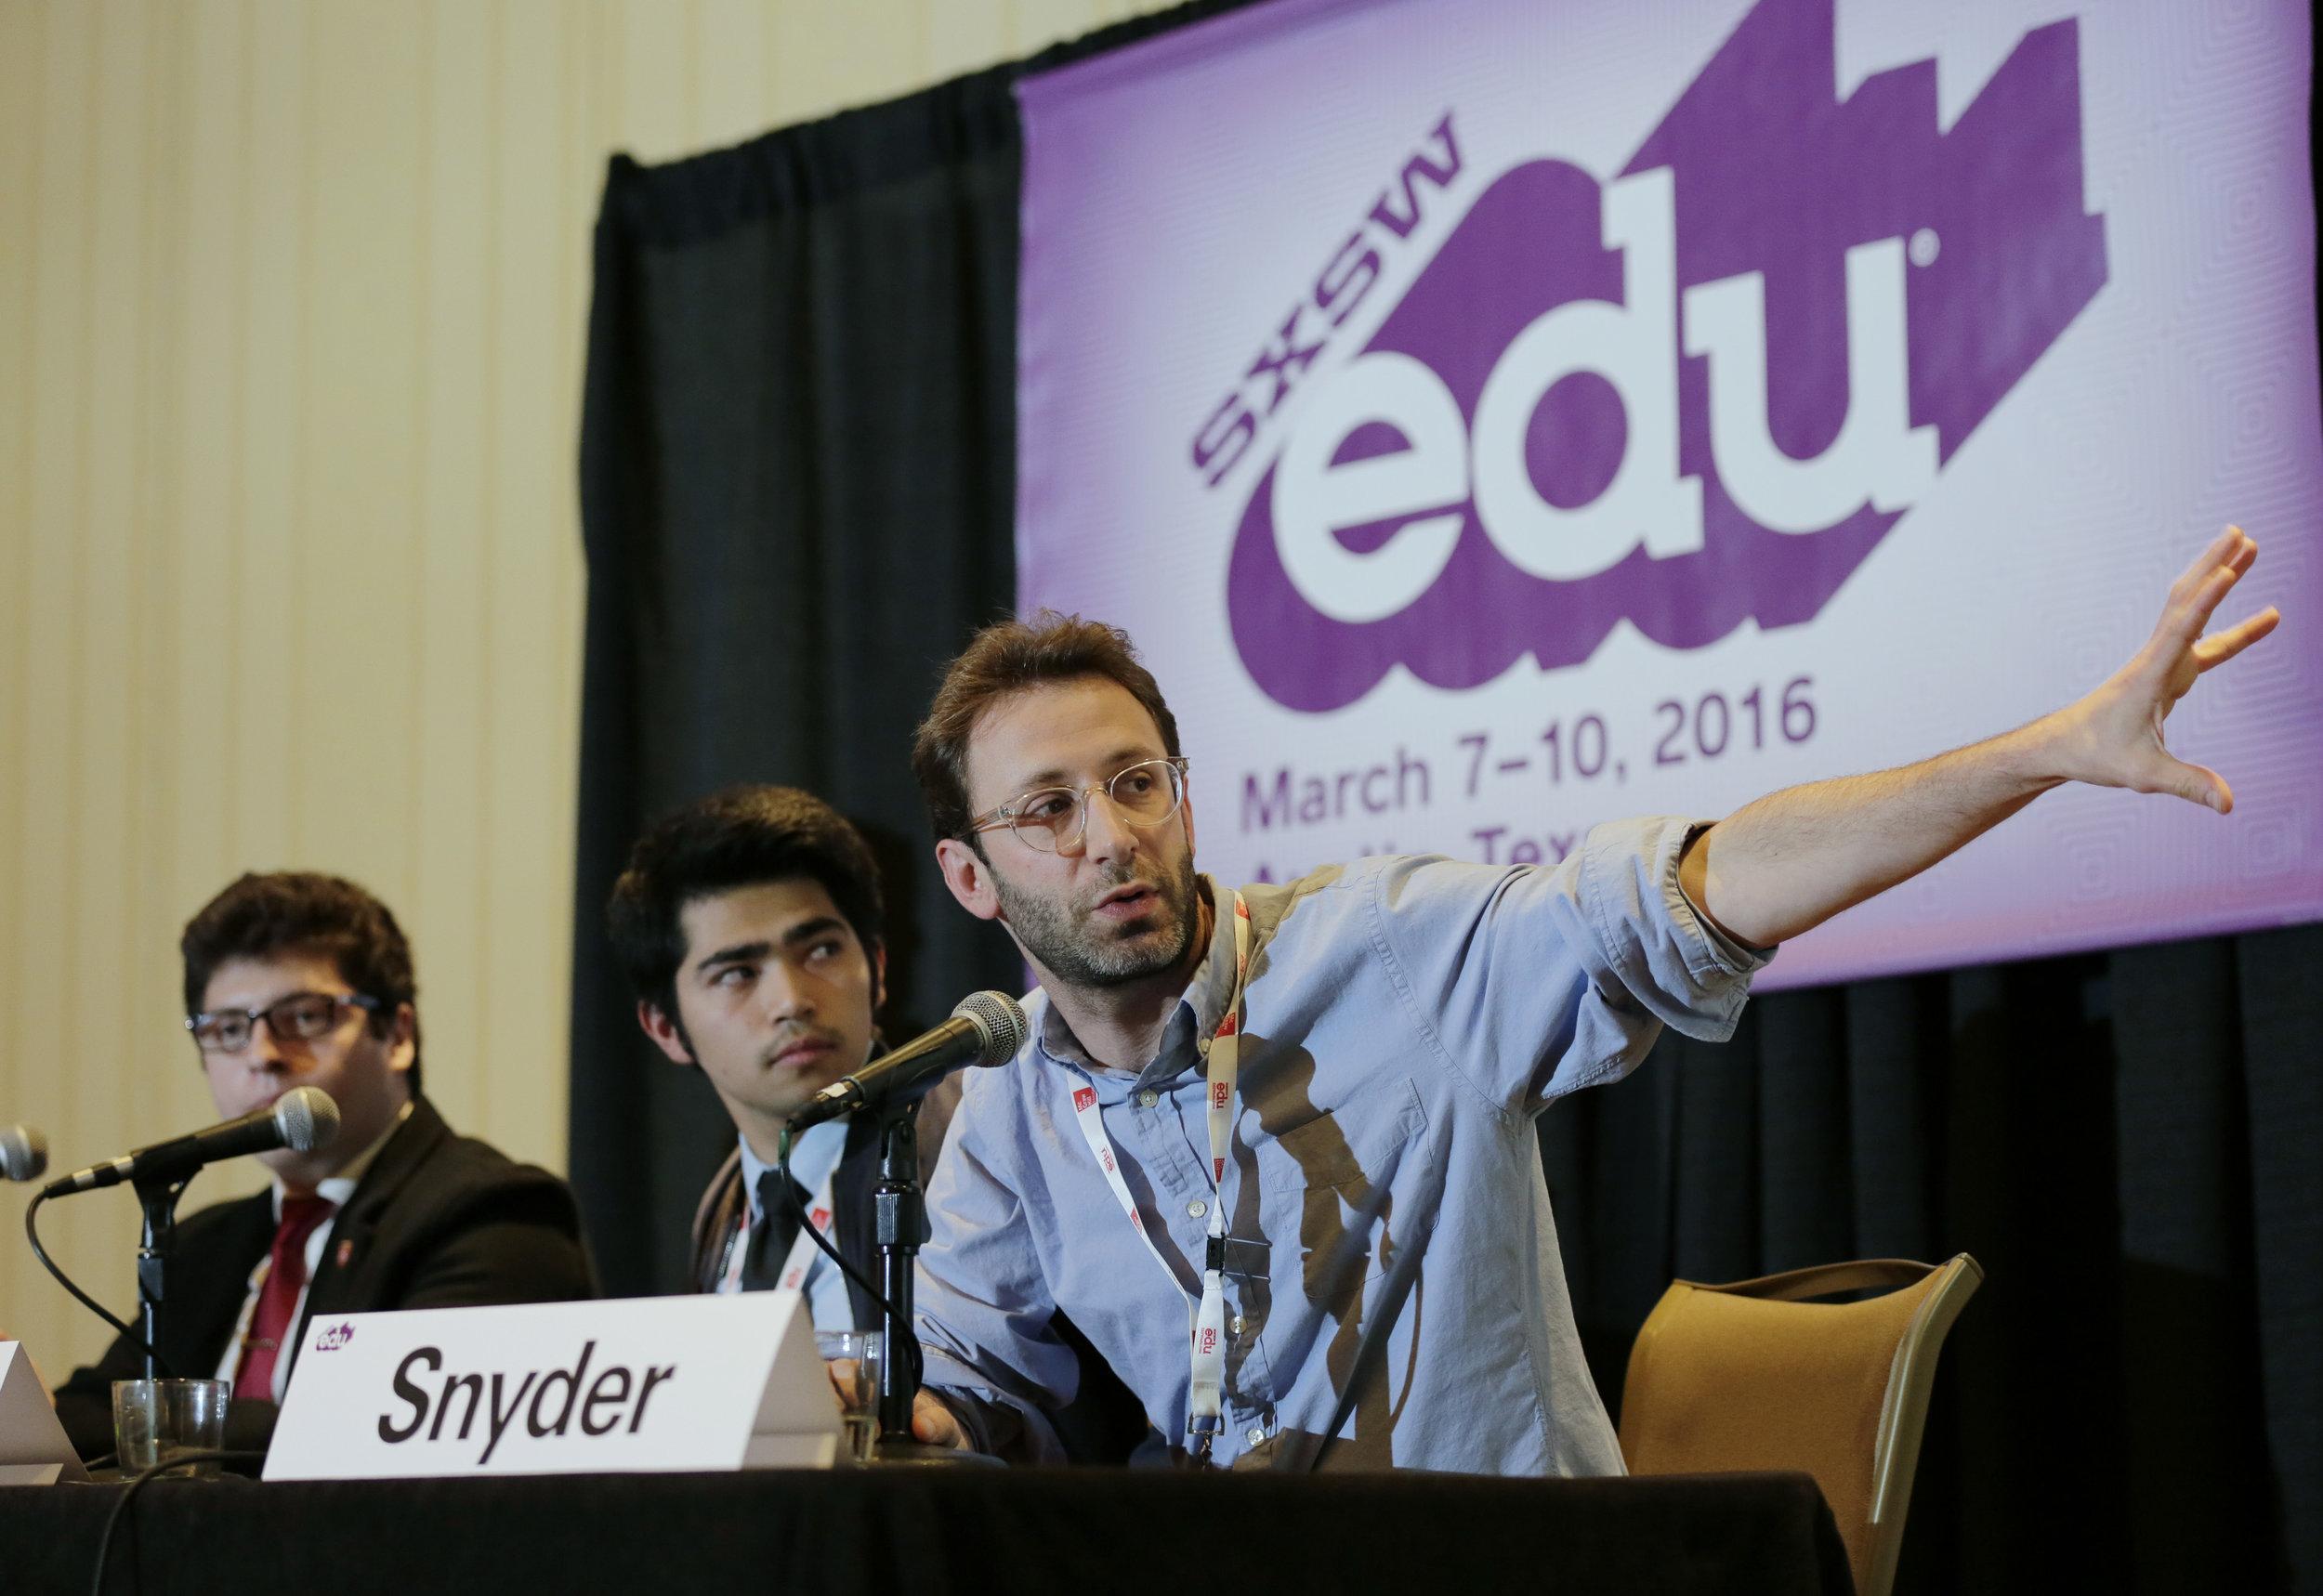 Mr. Snyder with APB alumni speaking at SXSWedu in 2016.